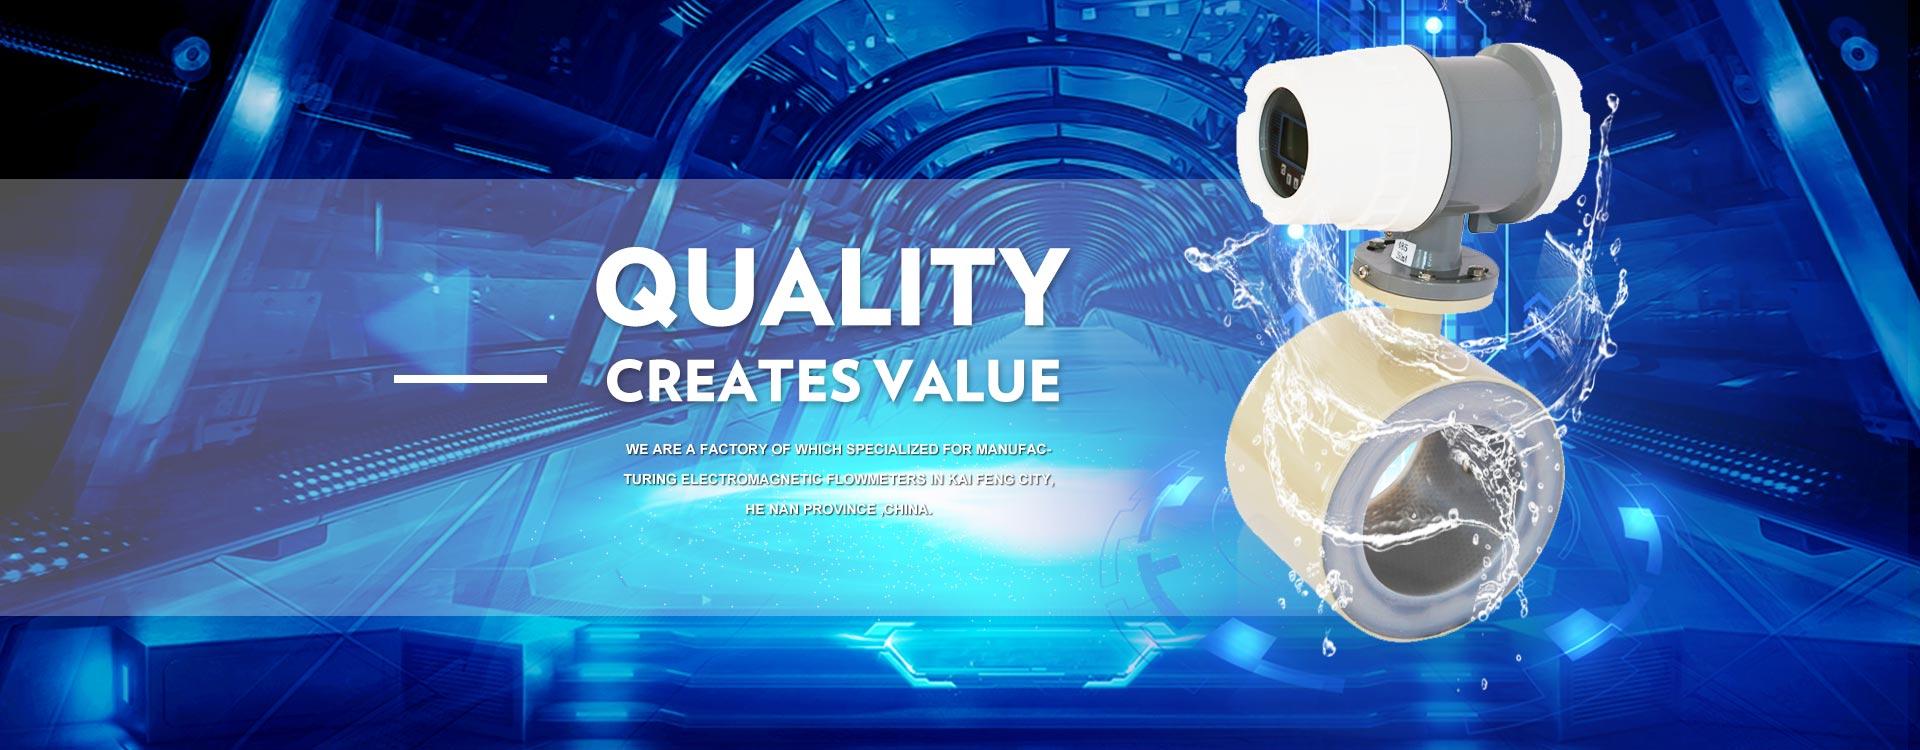 LG Orifice Plate Meter, MGG/Z Rota Meter